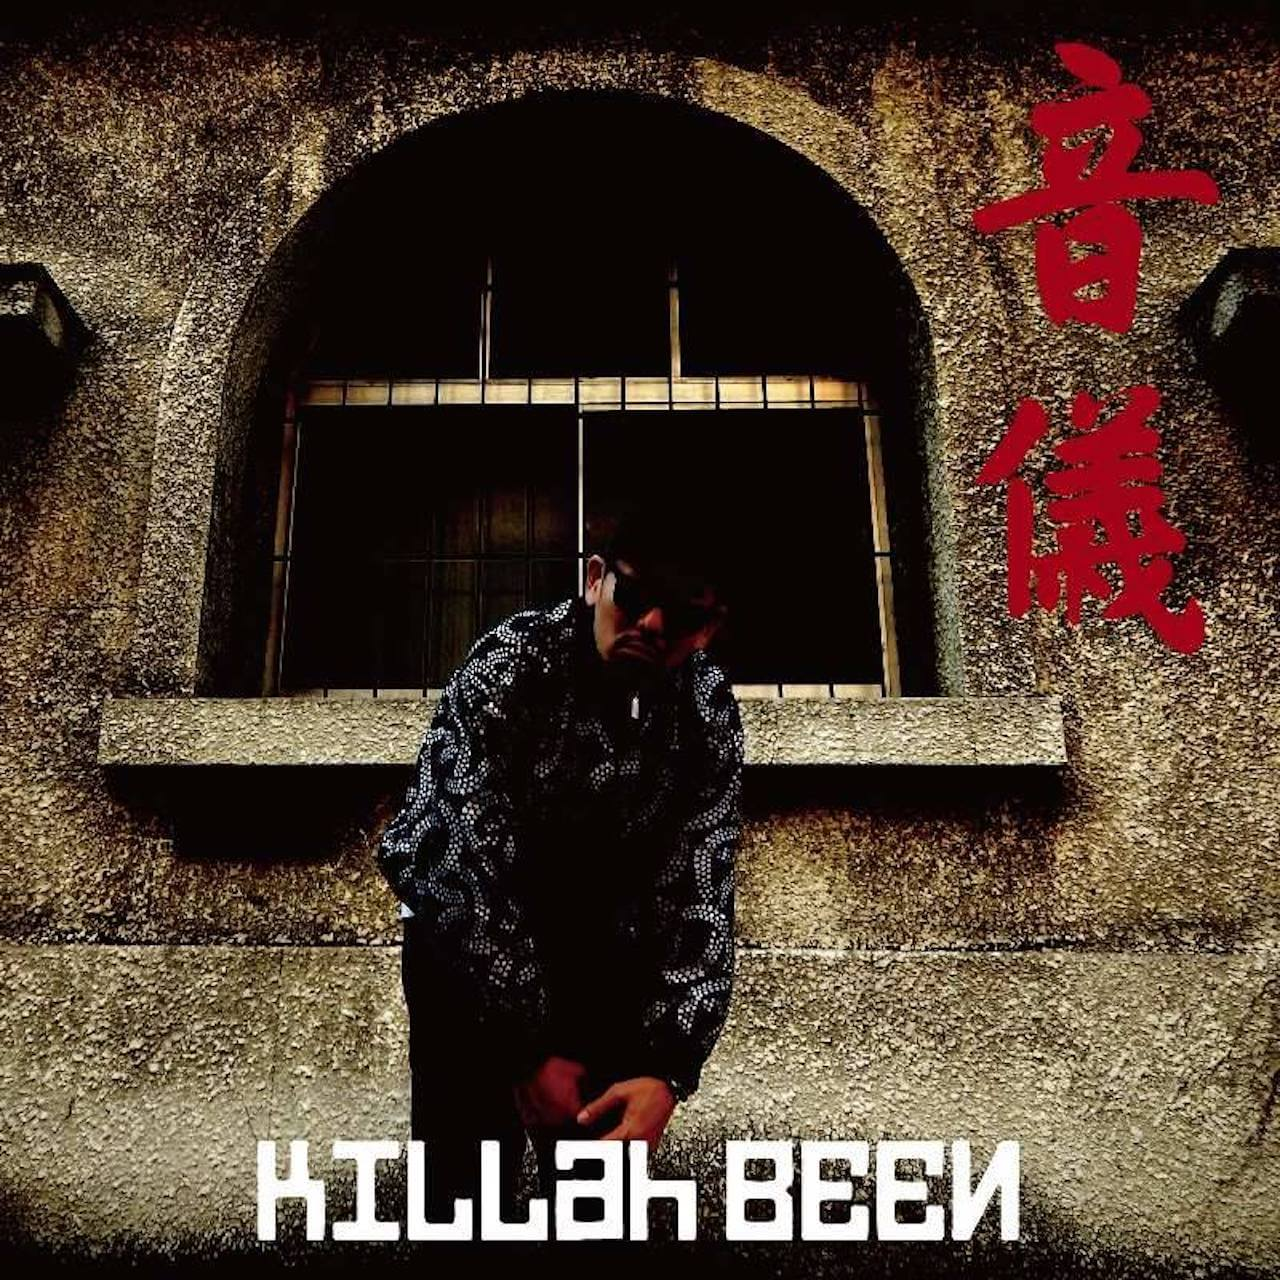 KILLah BEENが3rdアルバム『音儀』を10月リリース、Bugseedプロデュース「SHADOW」が先行解禁 アルバムにはCOBA5000、7SEEDS、alled(BLYY)らが参加 music20200919-killahbeen